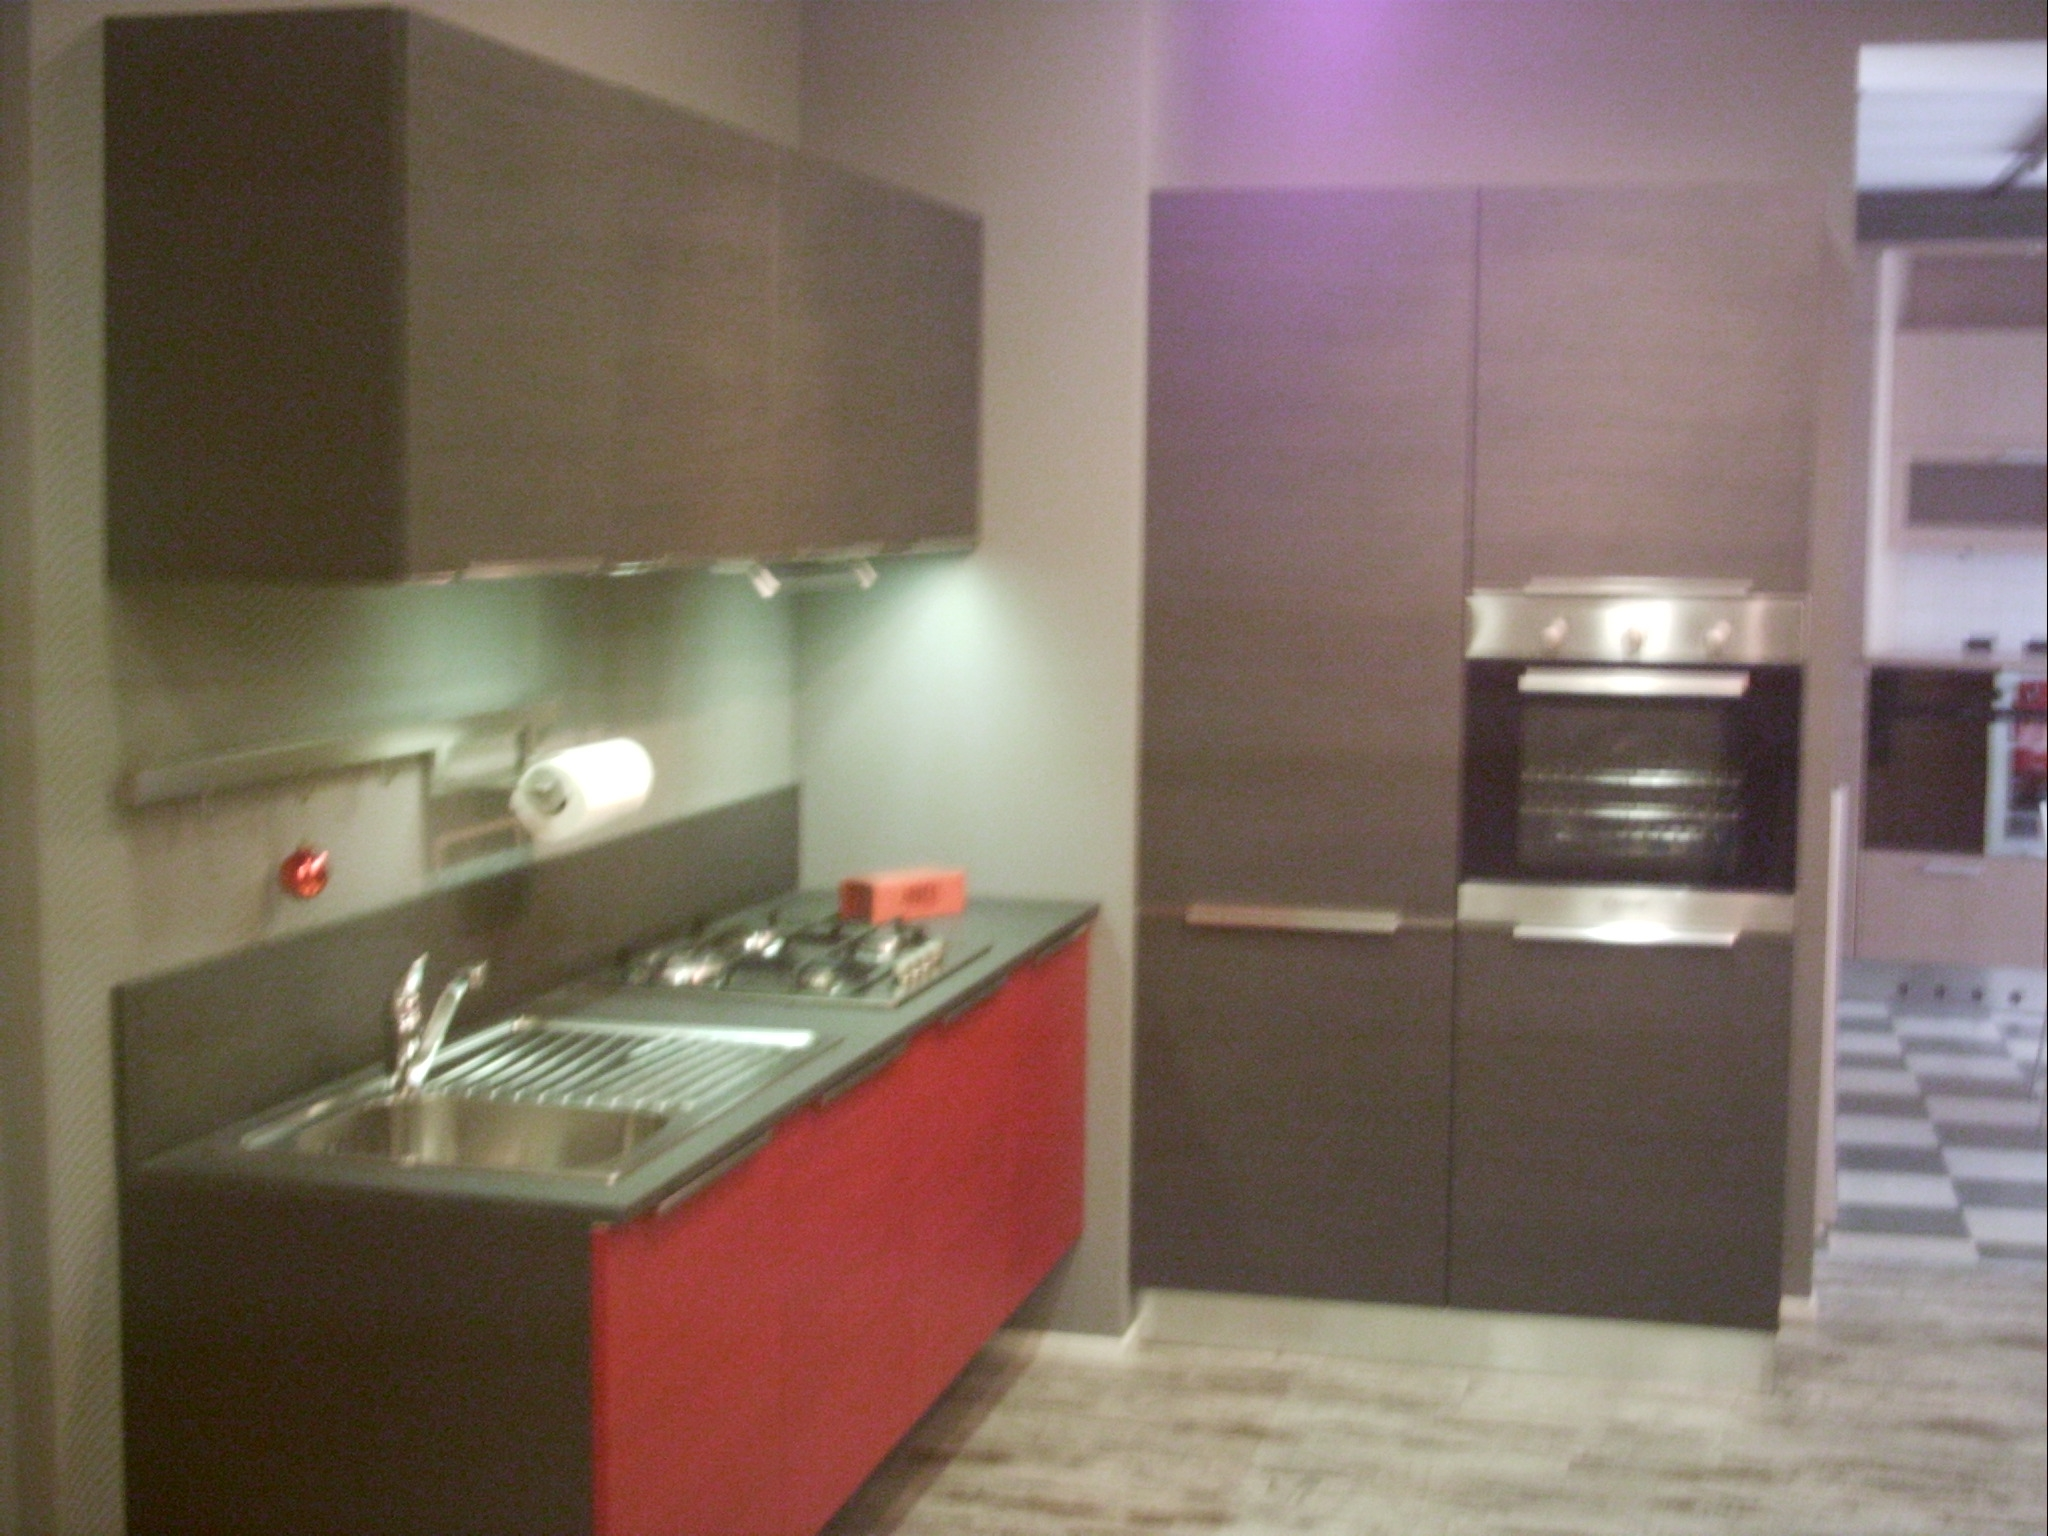 Cucina Rossa E Pareti : Cucina rossa e pareti. Cucina rossa e ...